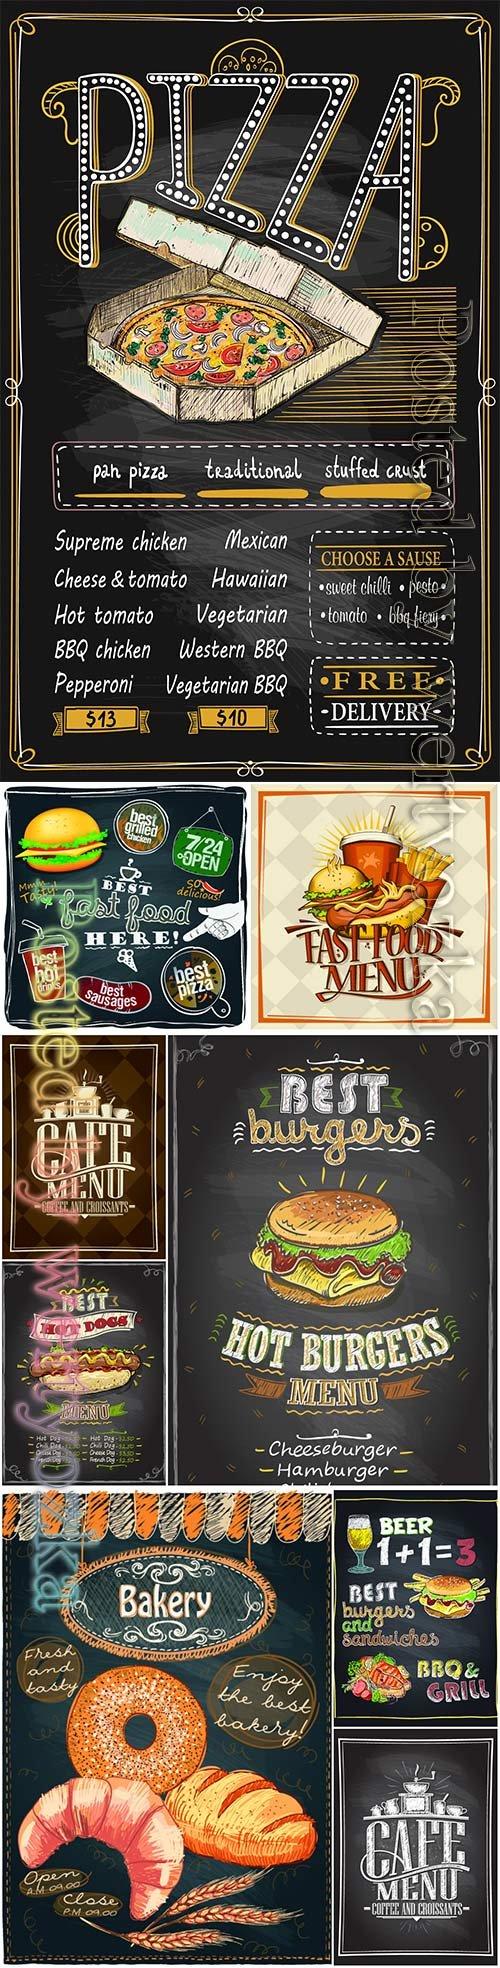 Cafe menu card design, fast food, pizza